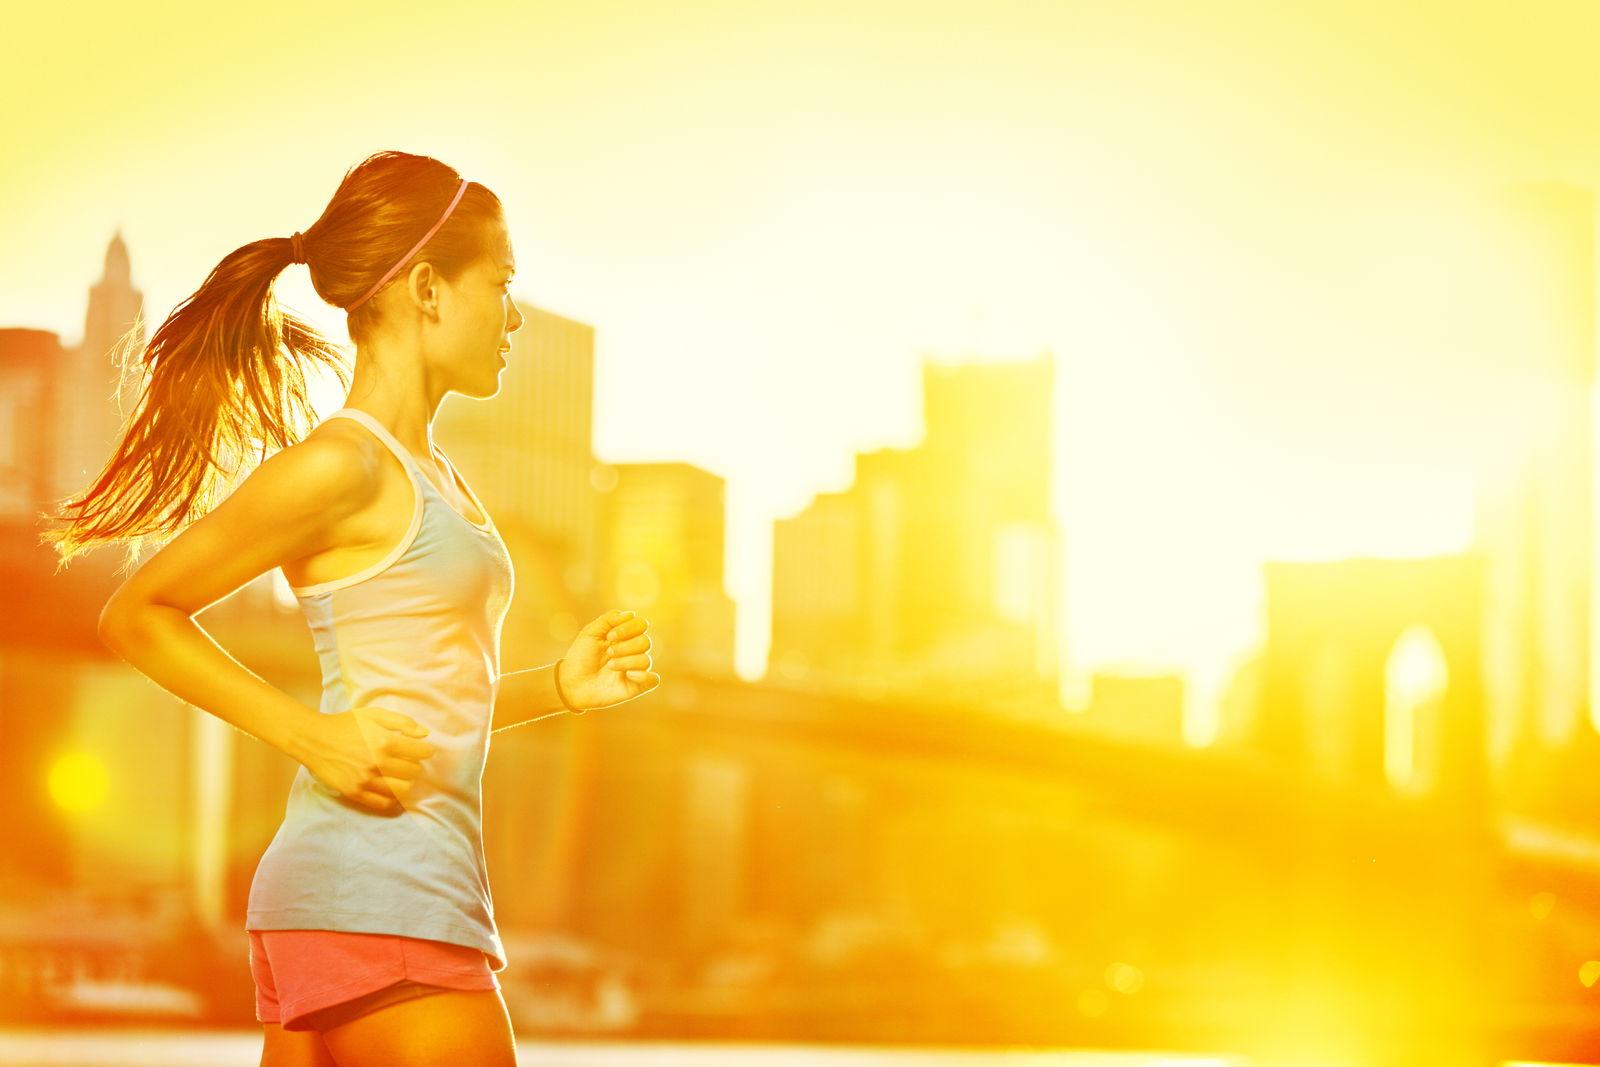 #WorkoutWednesday: Kellie Davis shares a workout from her Bodyweight and Bands Program!